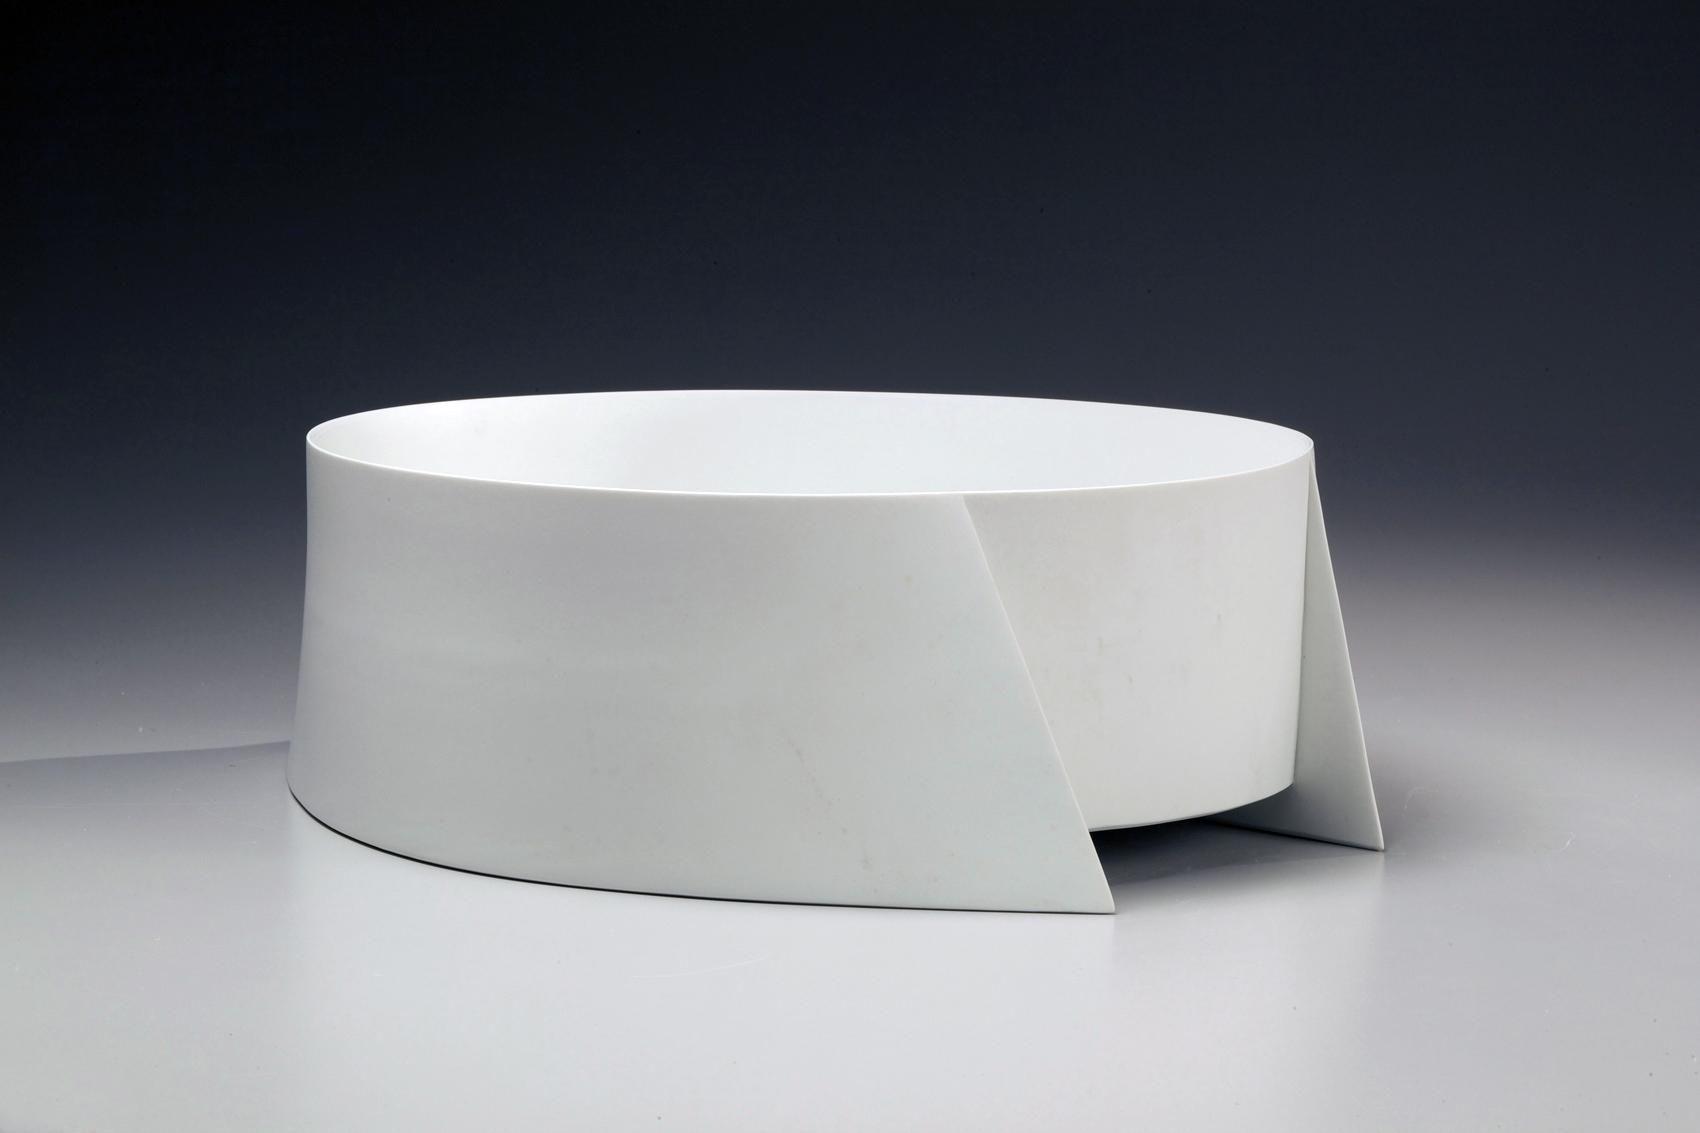 Wada Akira, Japanese white porcelain, Japanese sculpture, ca. 2011